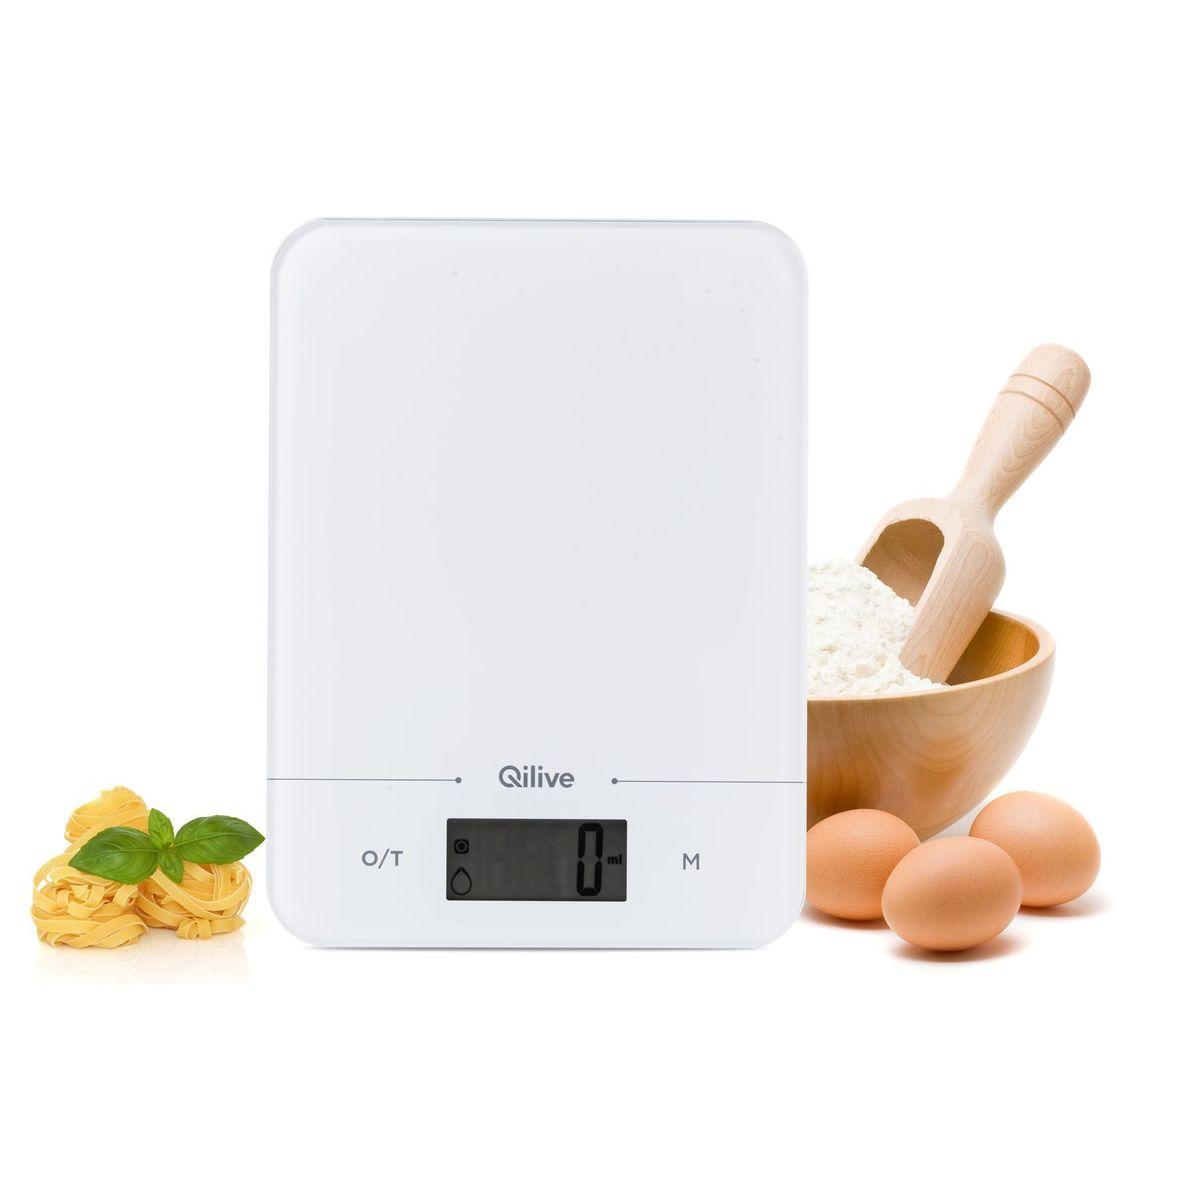 Balance de cuisine 130299 - Blanc